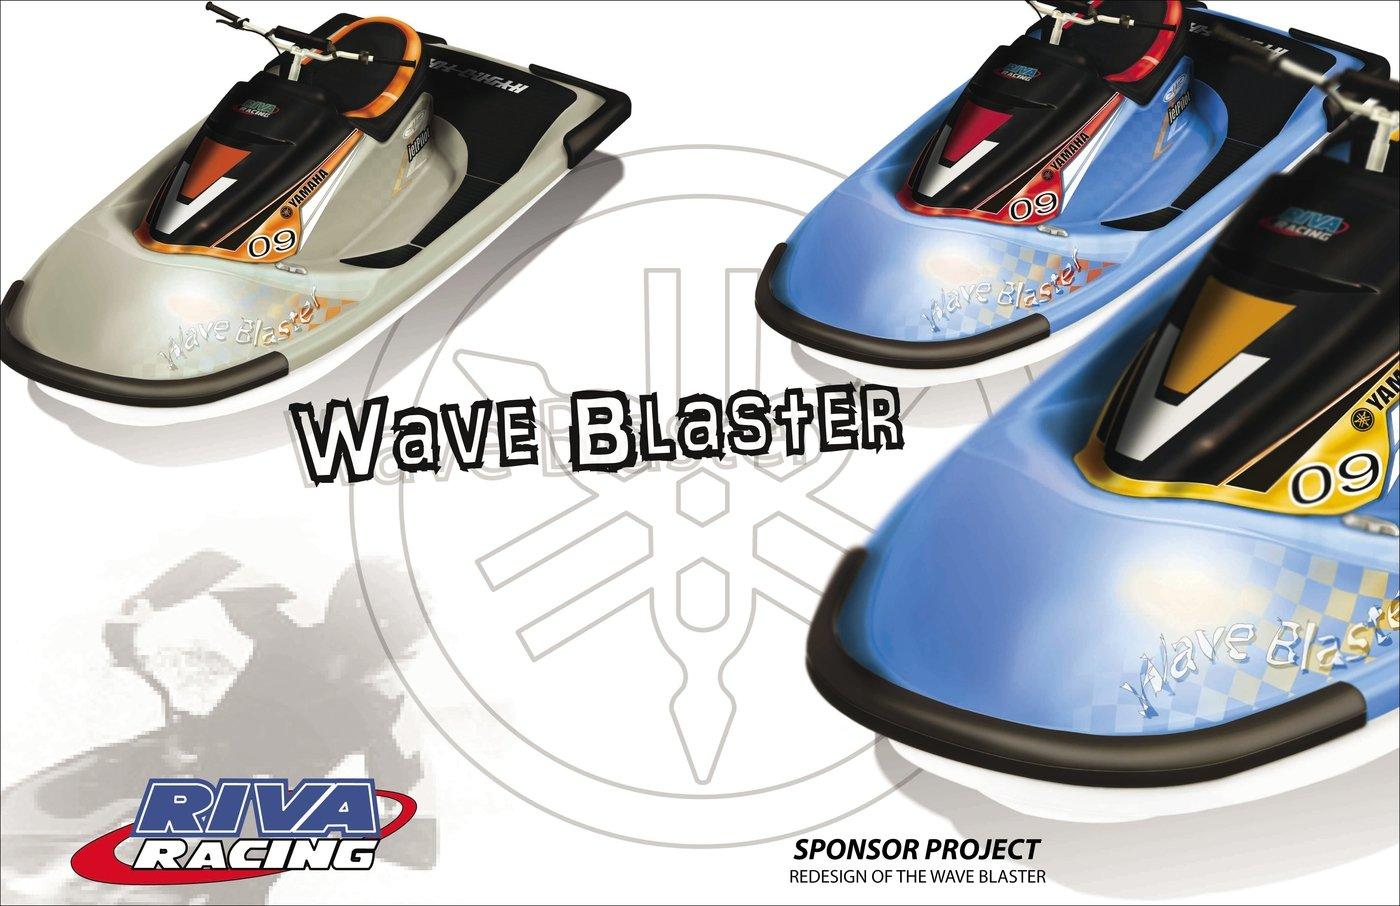 Wave Blaster by Francisco Diaz at Coroflot com